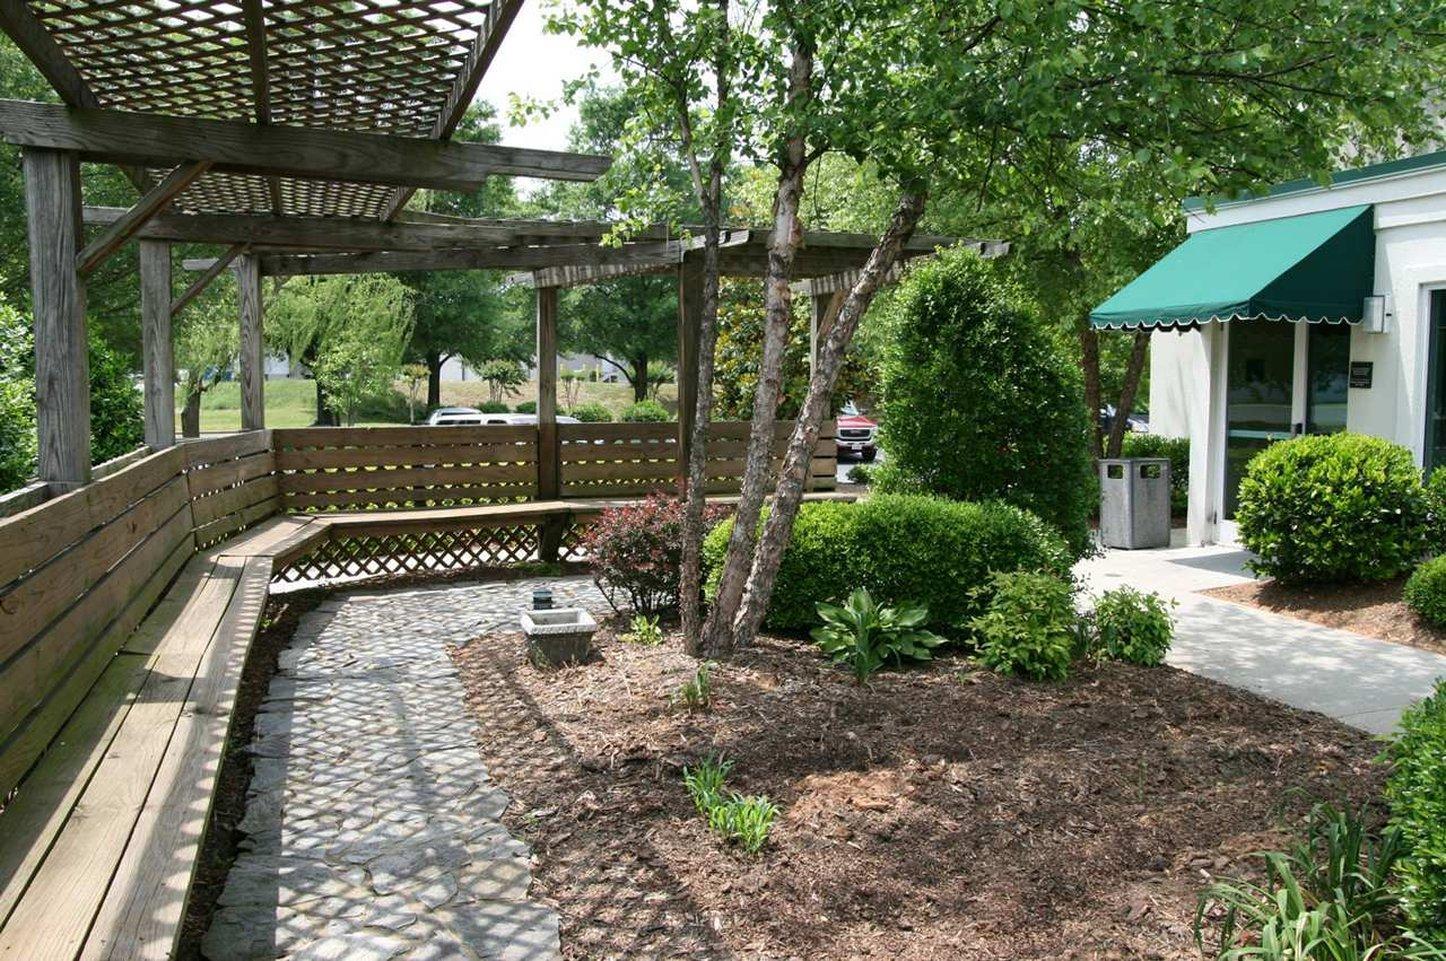 Hampton Inn and Suites Charlotte Pineville